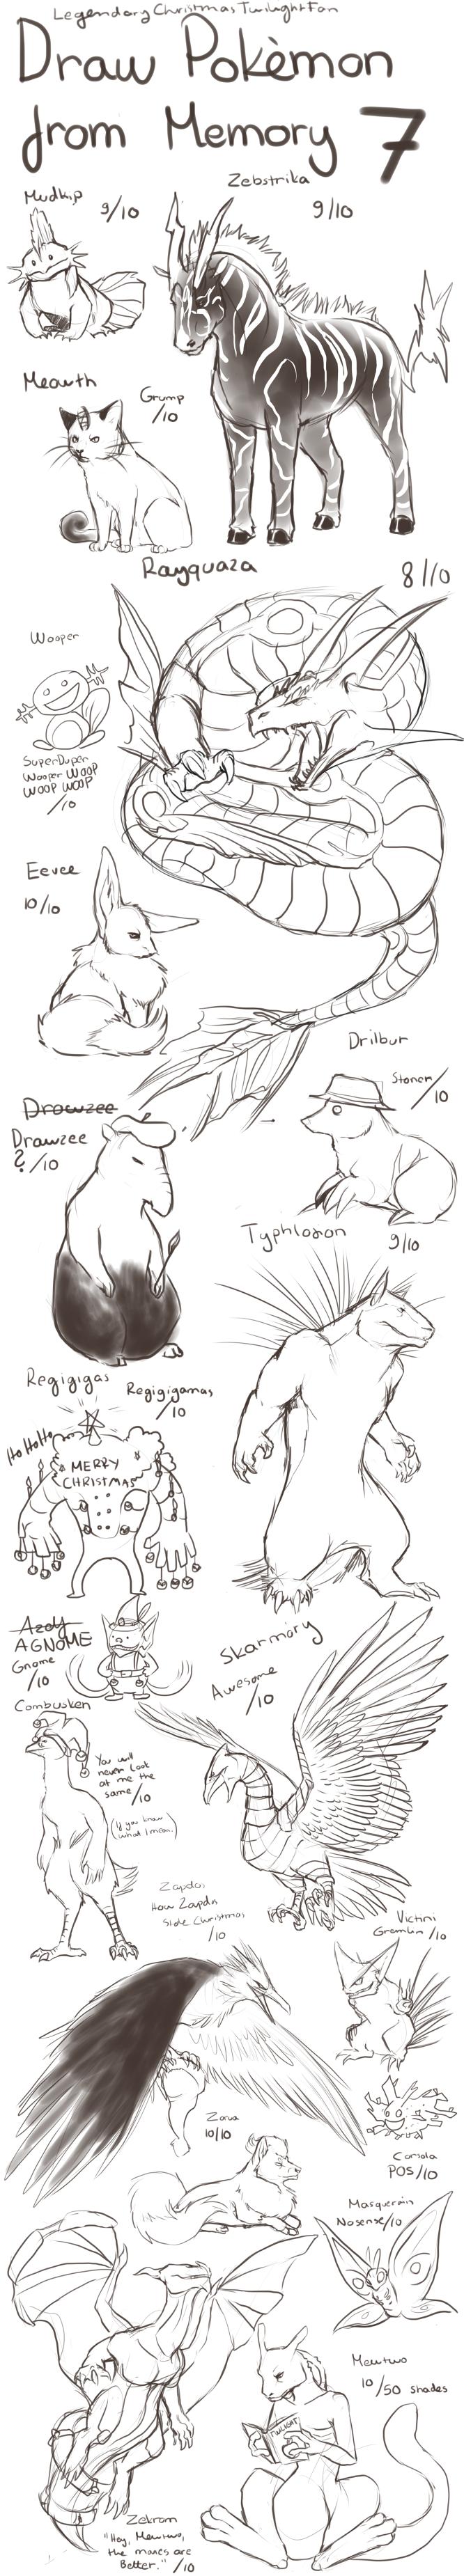 Draw Pokemon From Memory 7 by ShadeofShinon